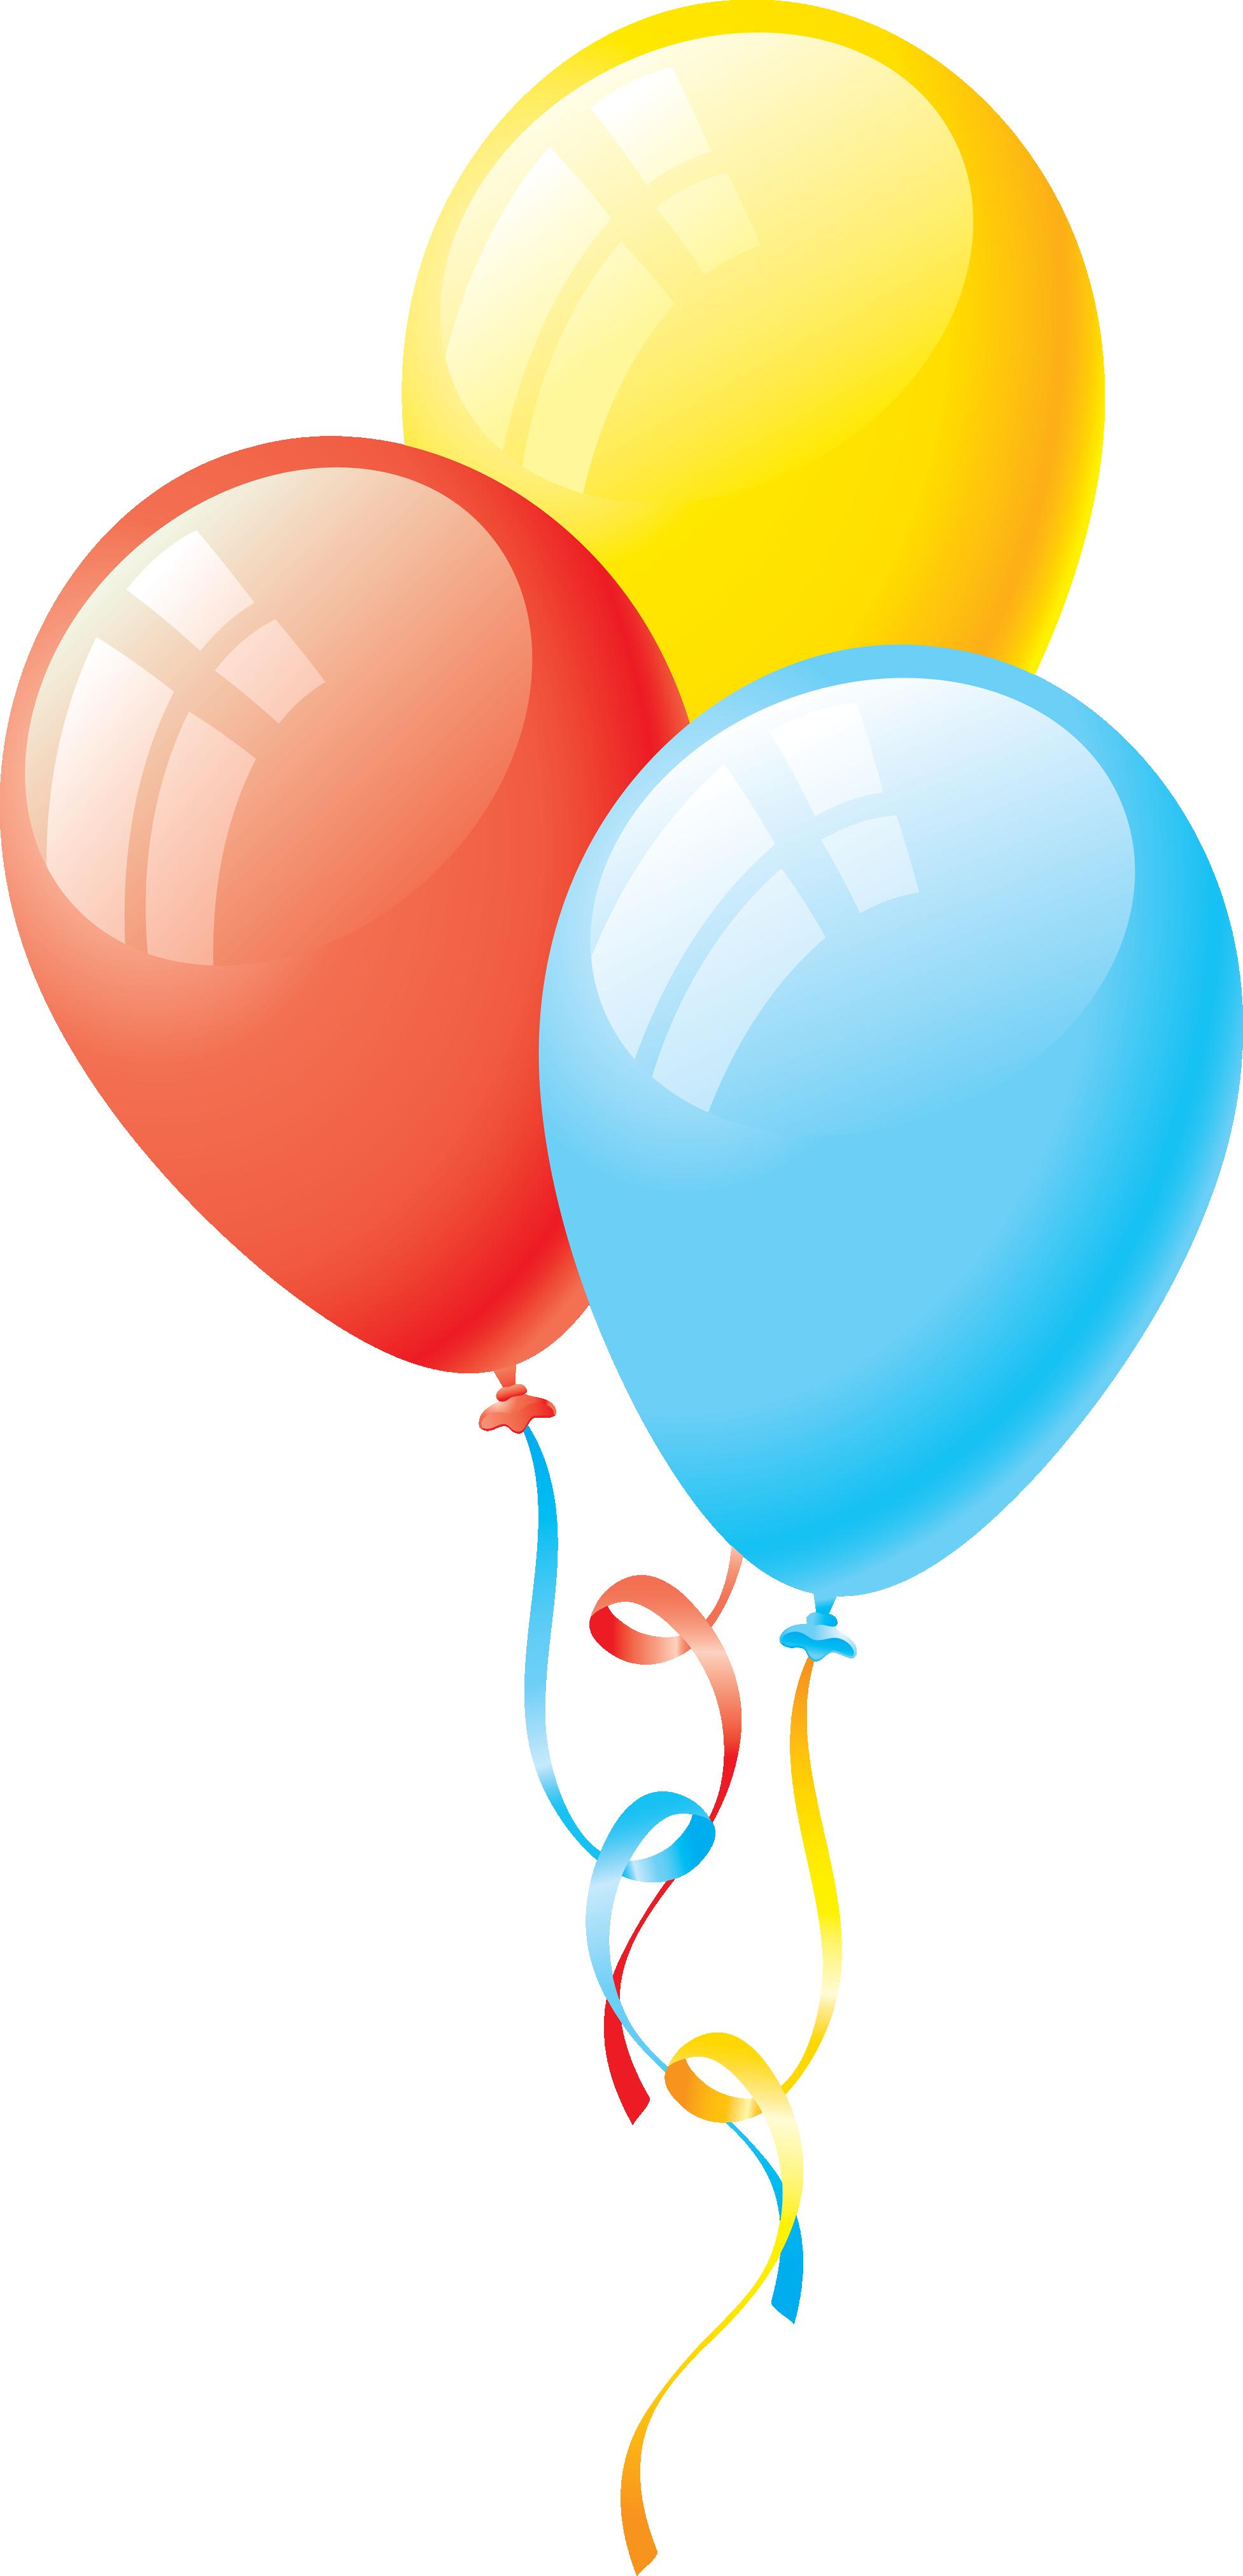 Balloons Png 5 PNG Image -  Balloons PNG HD